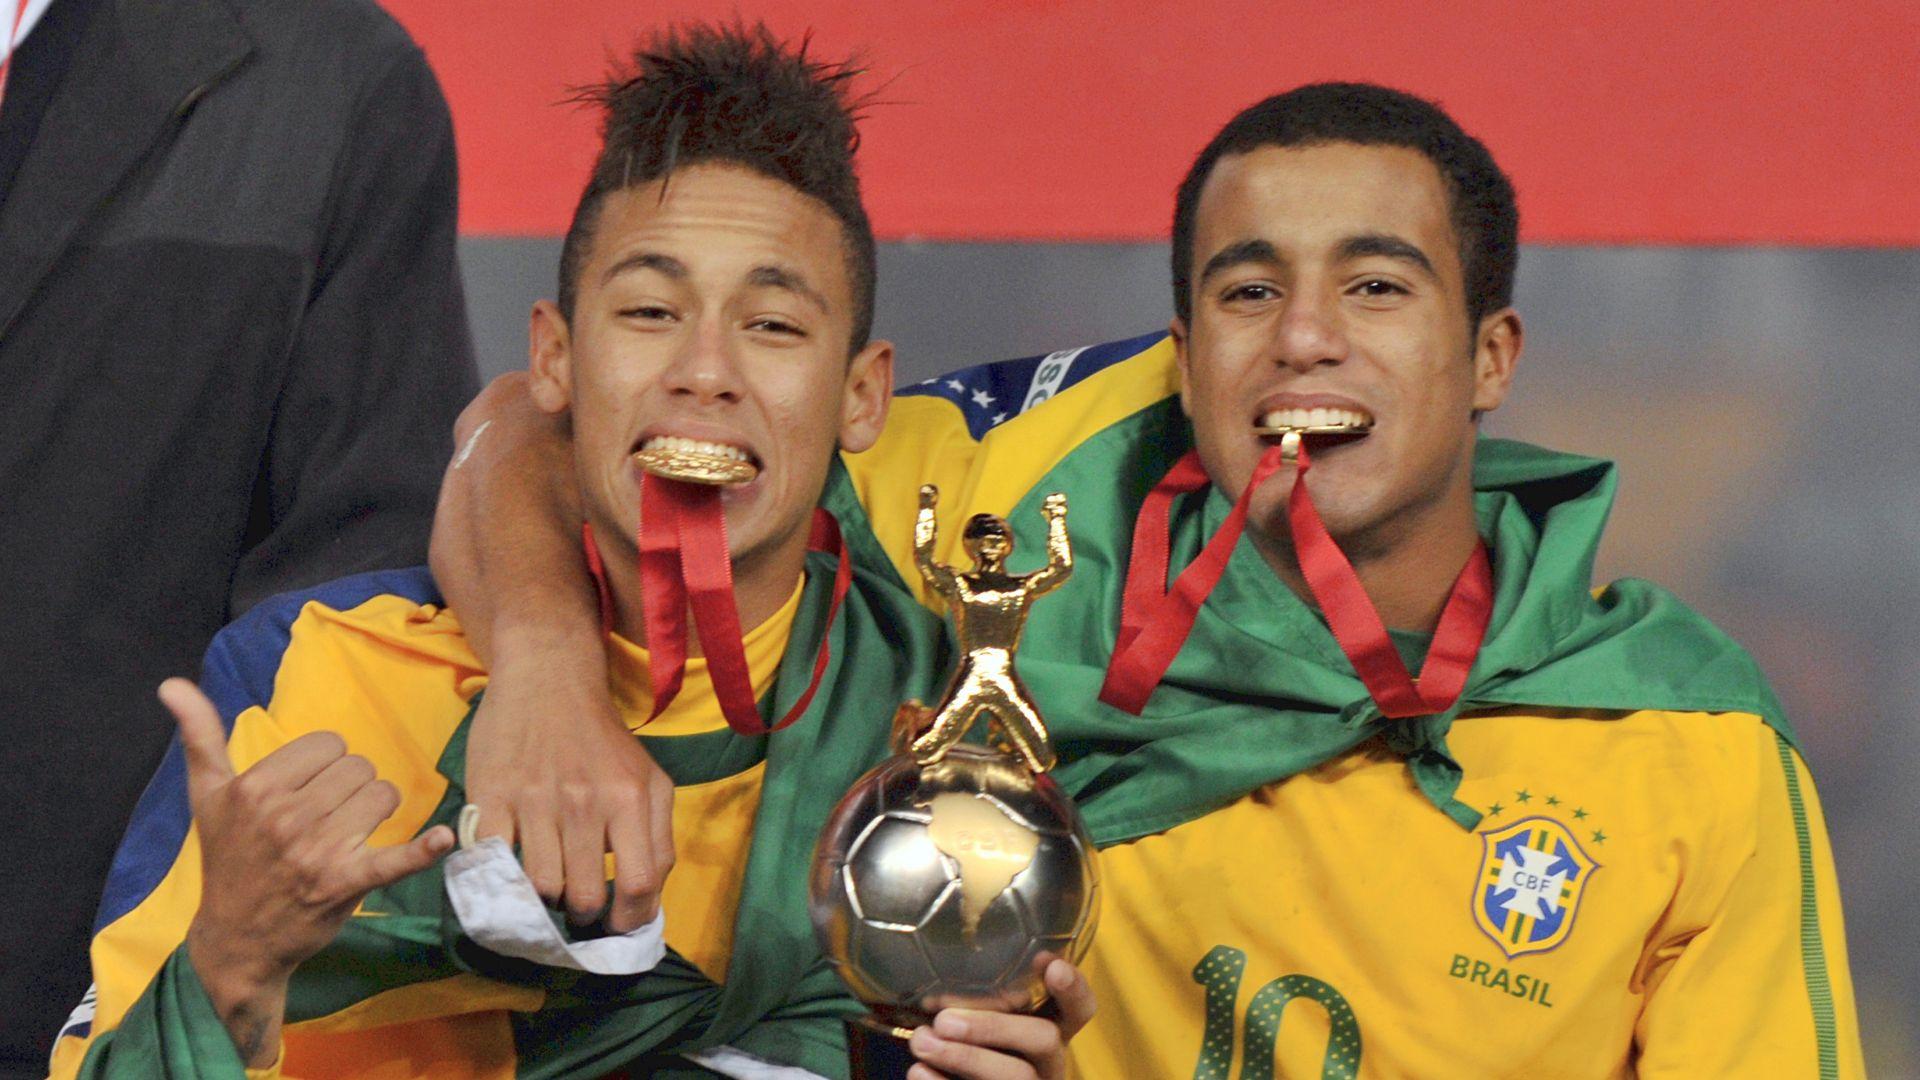 Neymar Lucas Moura 2011 Brazil U20 championship